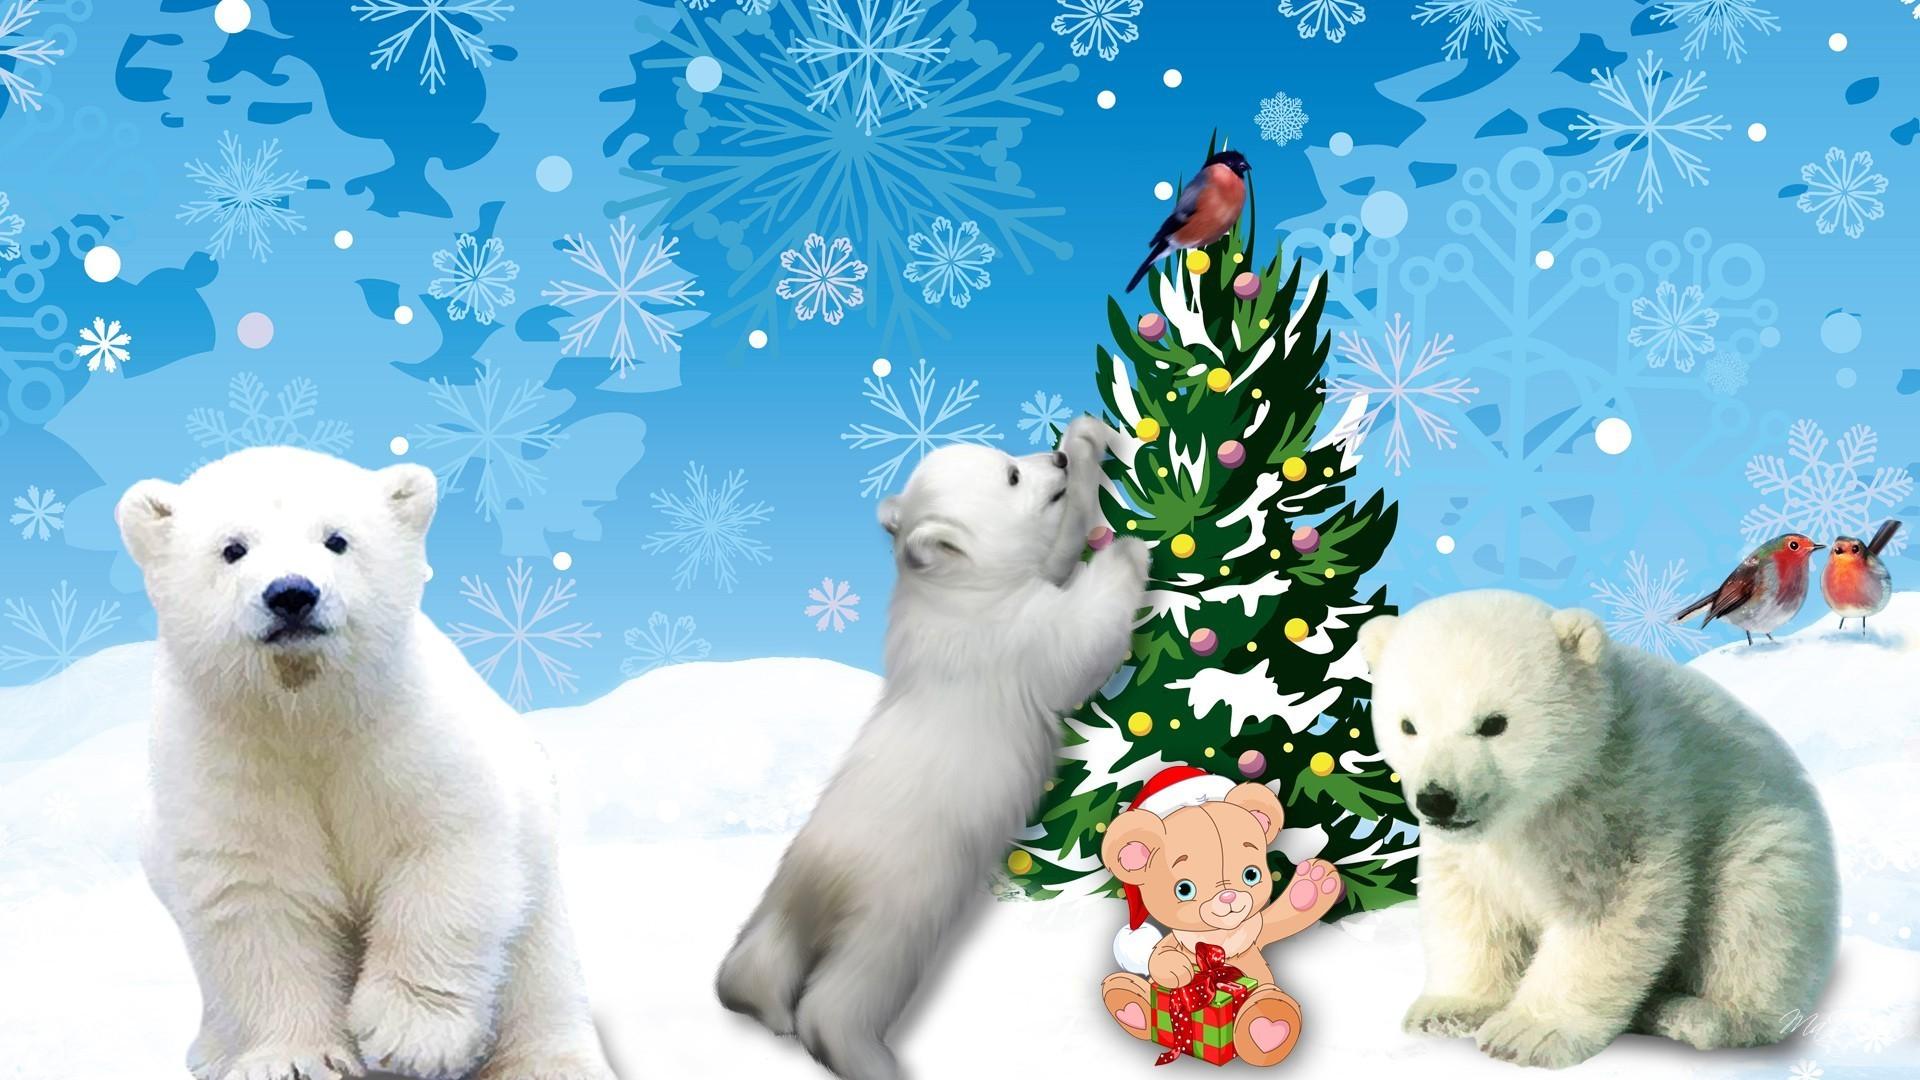 Snow Cute Polar Christmas Tree Winter Decorate Bears Animated Wallpaper  Windows 7 Detail